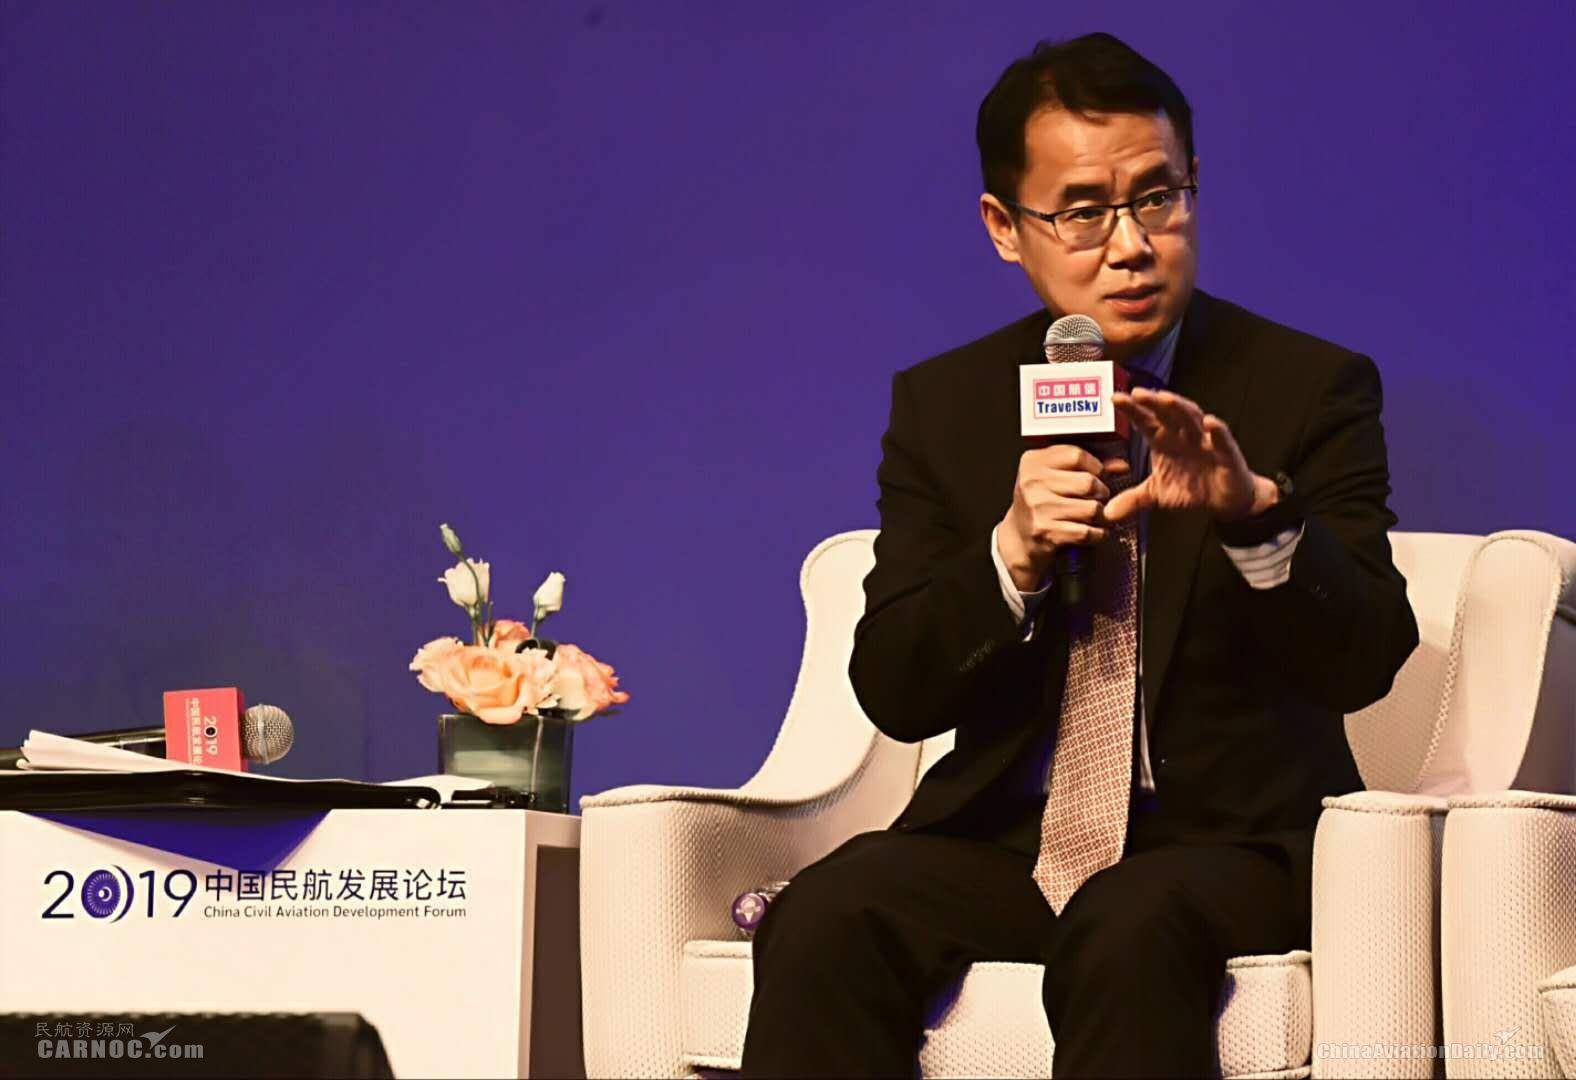 GE航空集团出席2019中国民航发展论坛